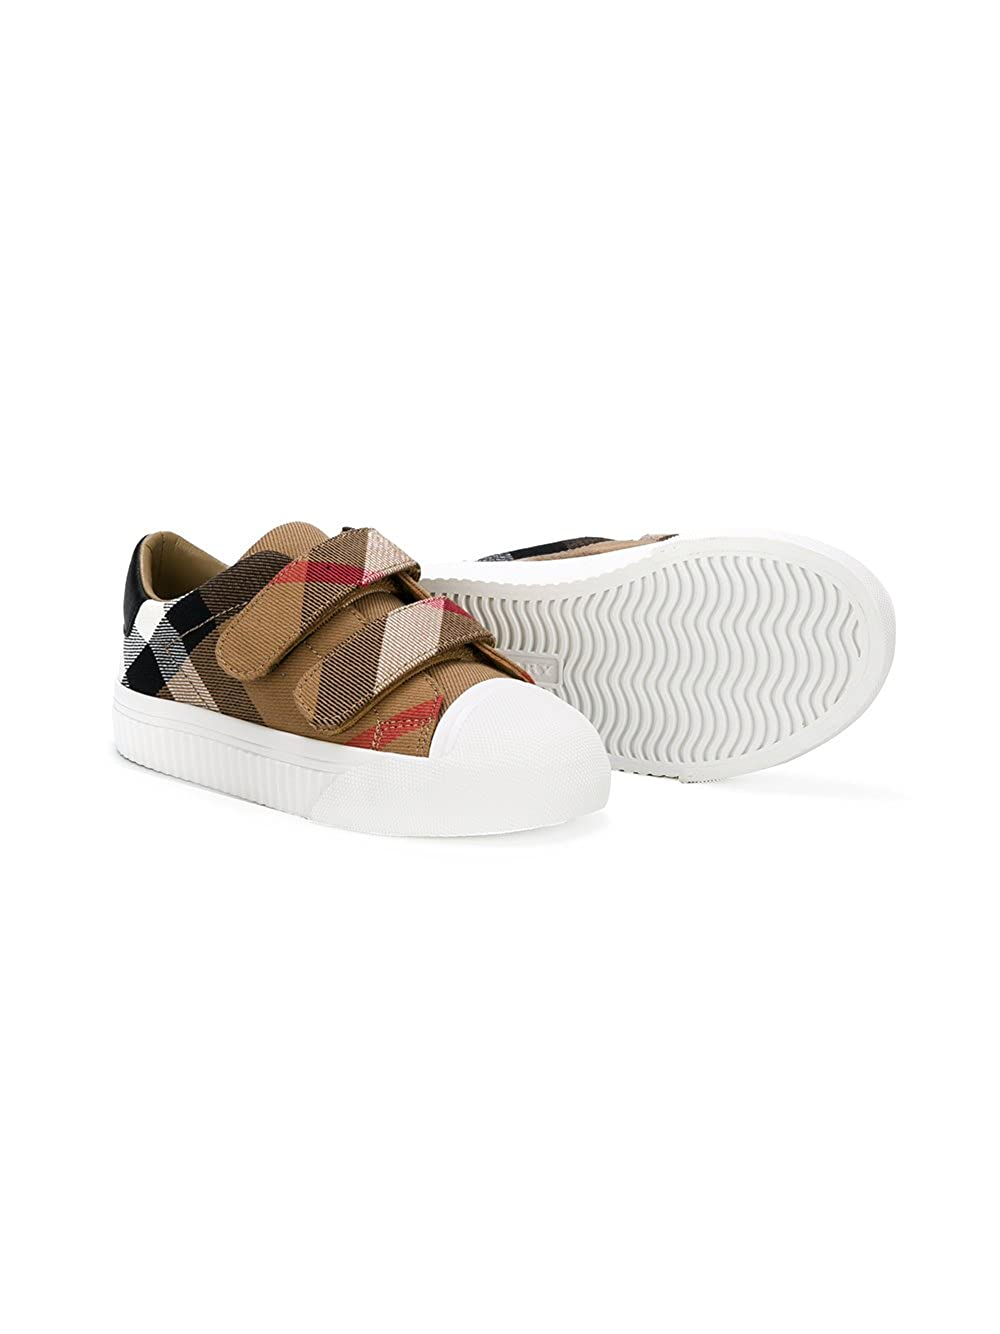 5aa801738fd6 BURBERRY Boy Check Cotton Canvas Sneakers Mod. 406507010700K 30:  Amazon.co.uk: Shoes & Bags